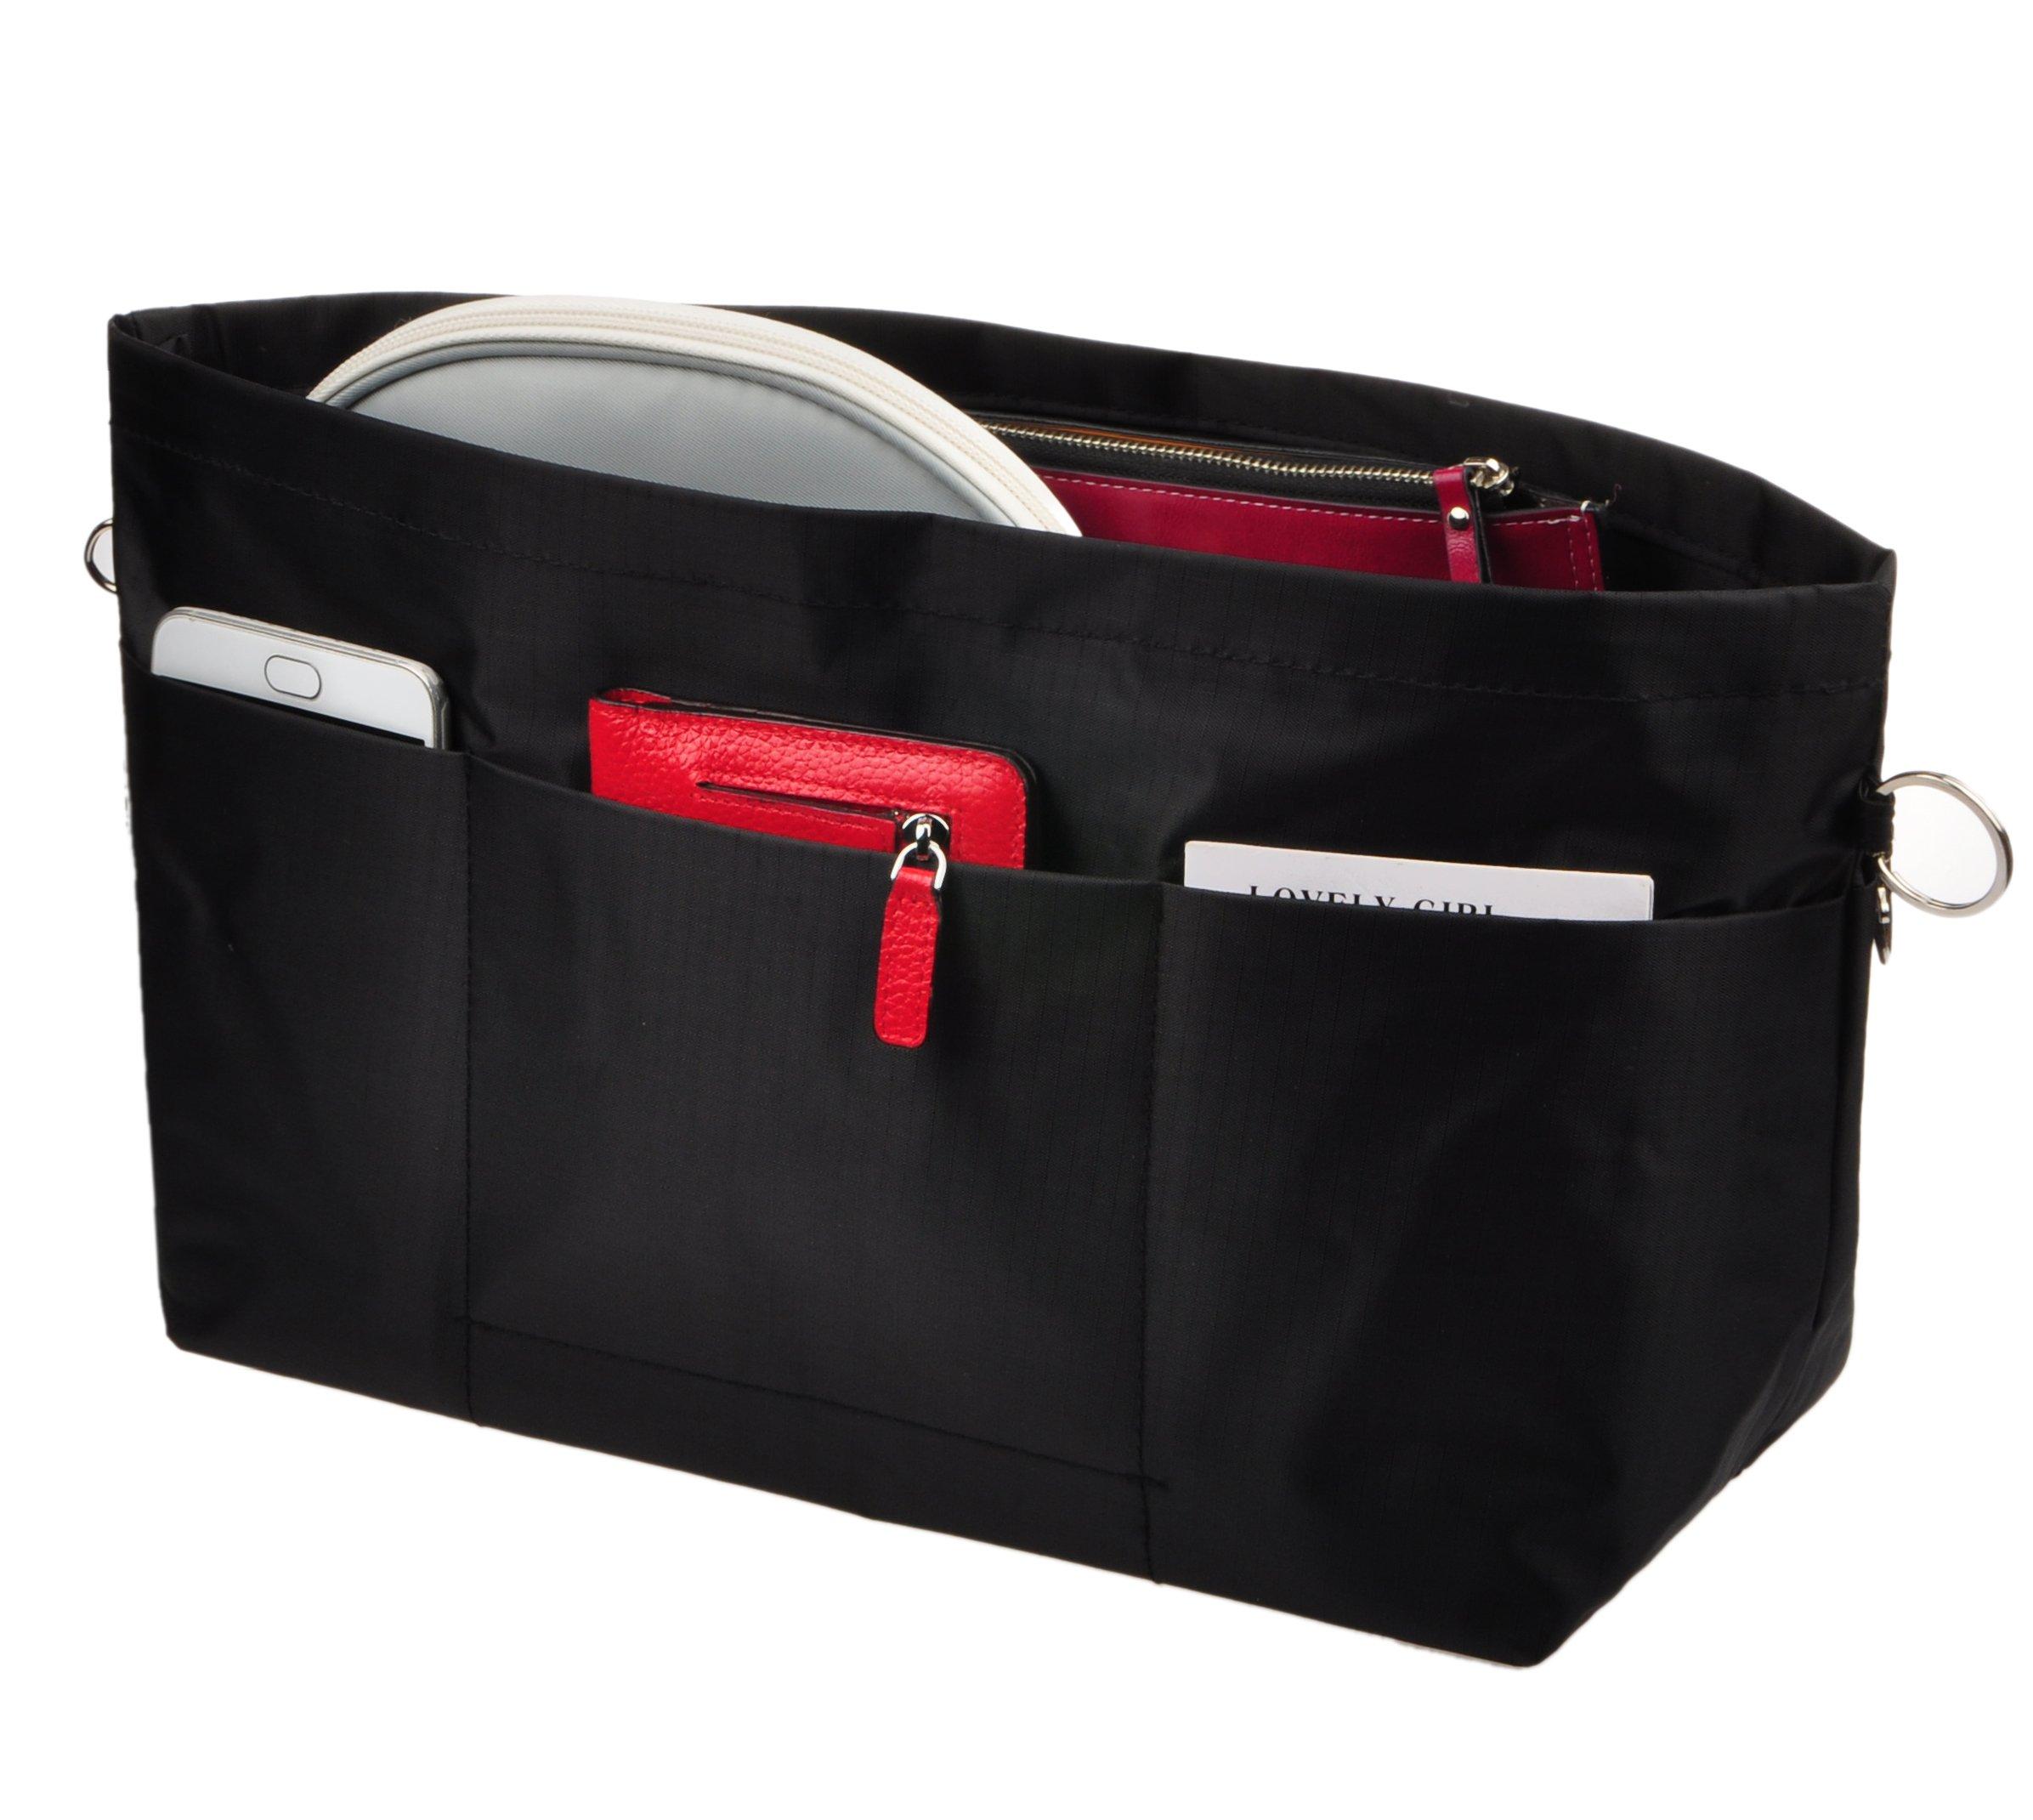 Vercord Handbag Purse Tote Pocketbook Organizer Insert Zipper Clousure 11 Pockets, Black M